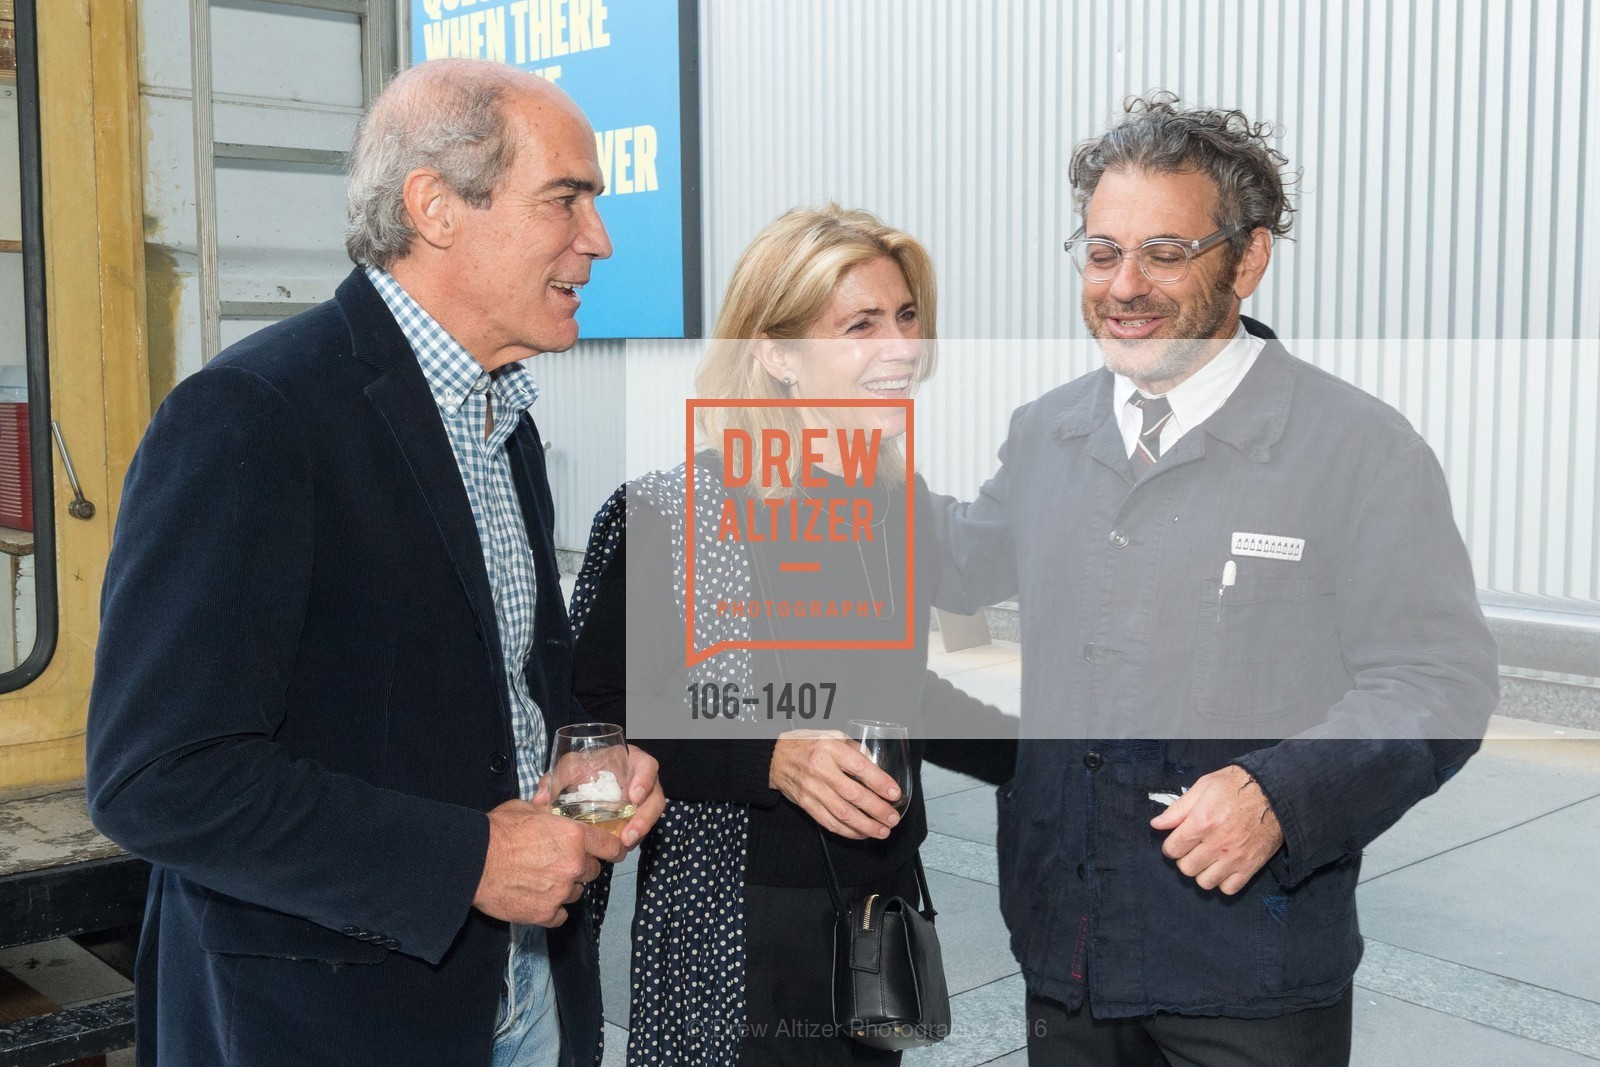 Ned Topham, Cathy Topham, Tom Sachs, Photo #106-1407